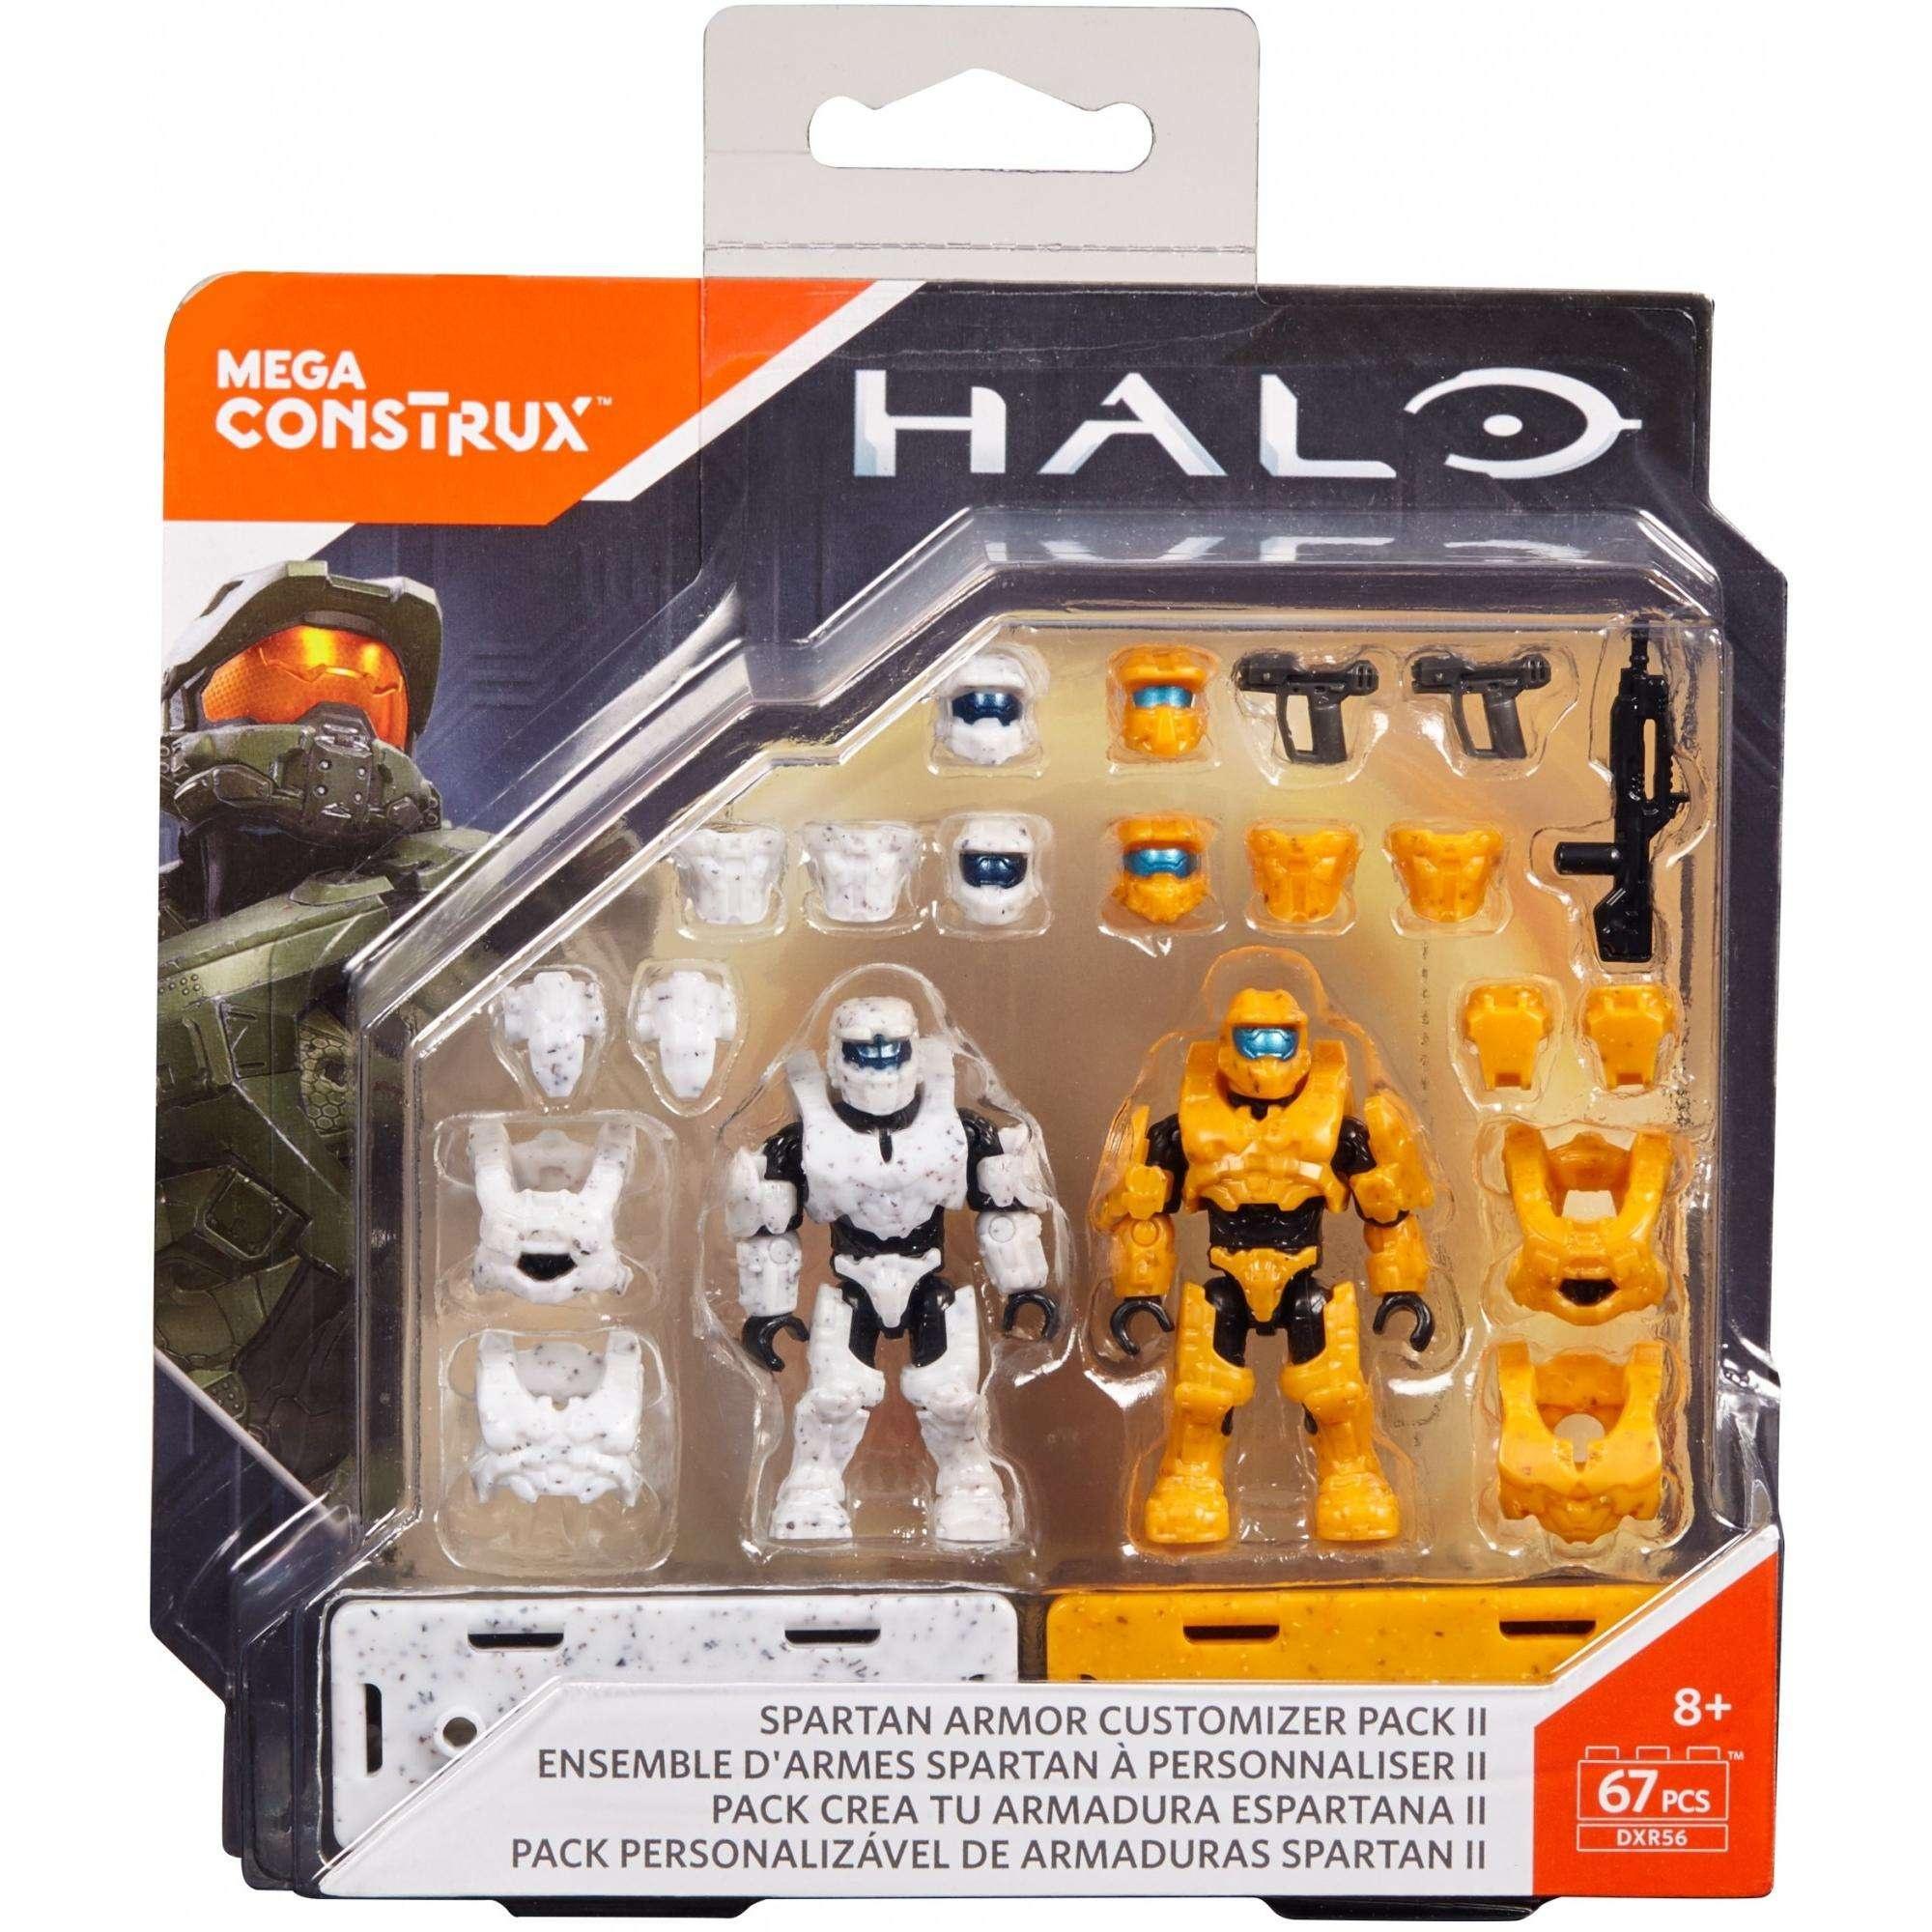 Mega Construx Halo Spartan Armour Customizer Pack Building Set